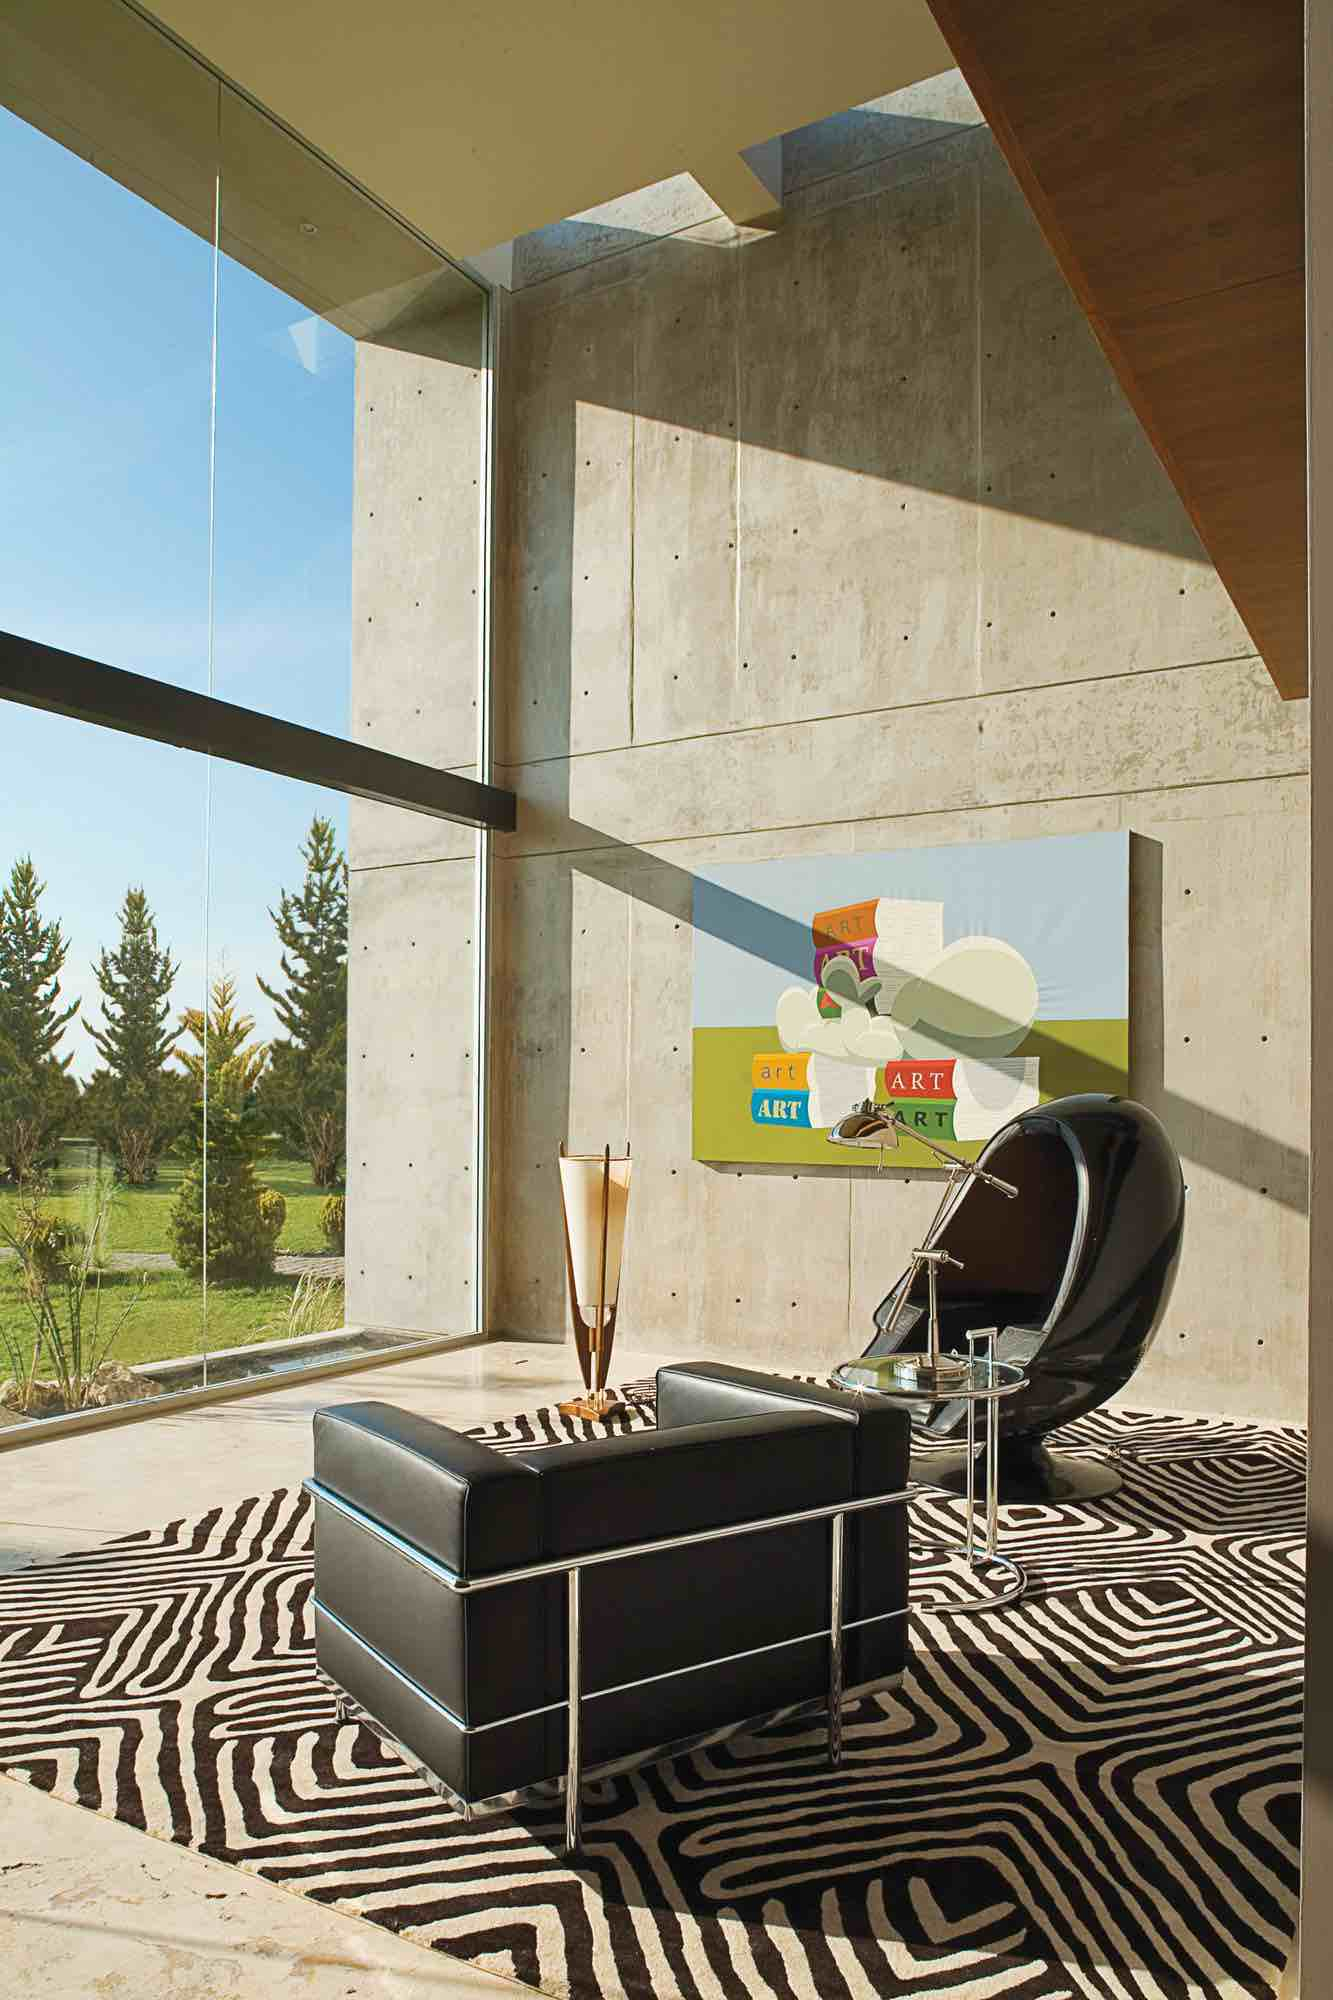 gp-house-bitar-arquitectos_9